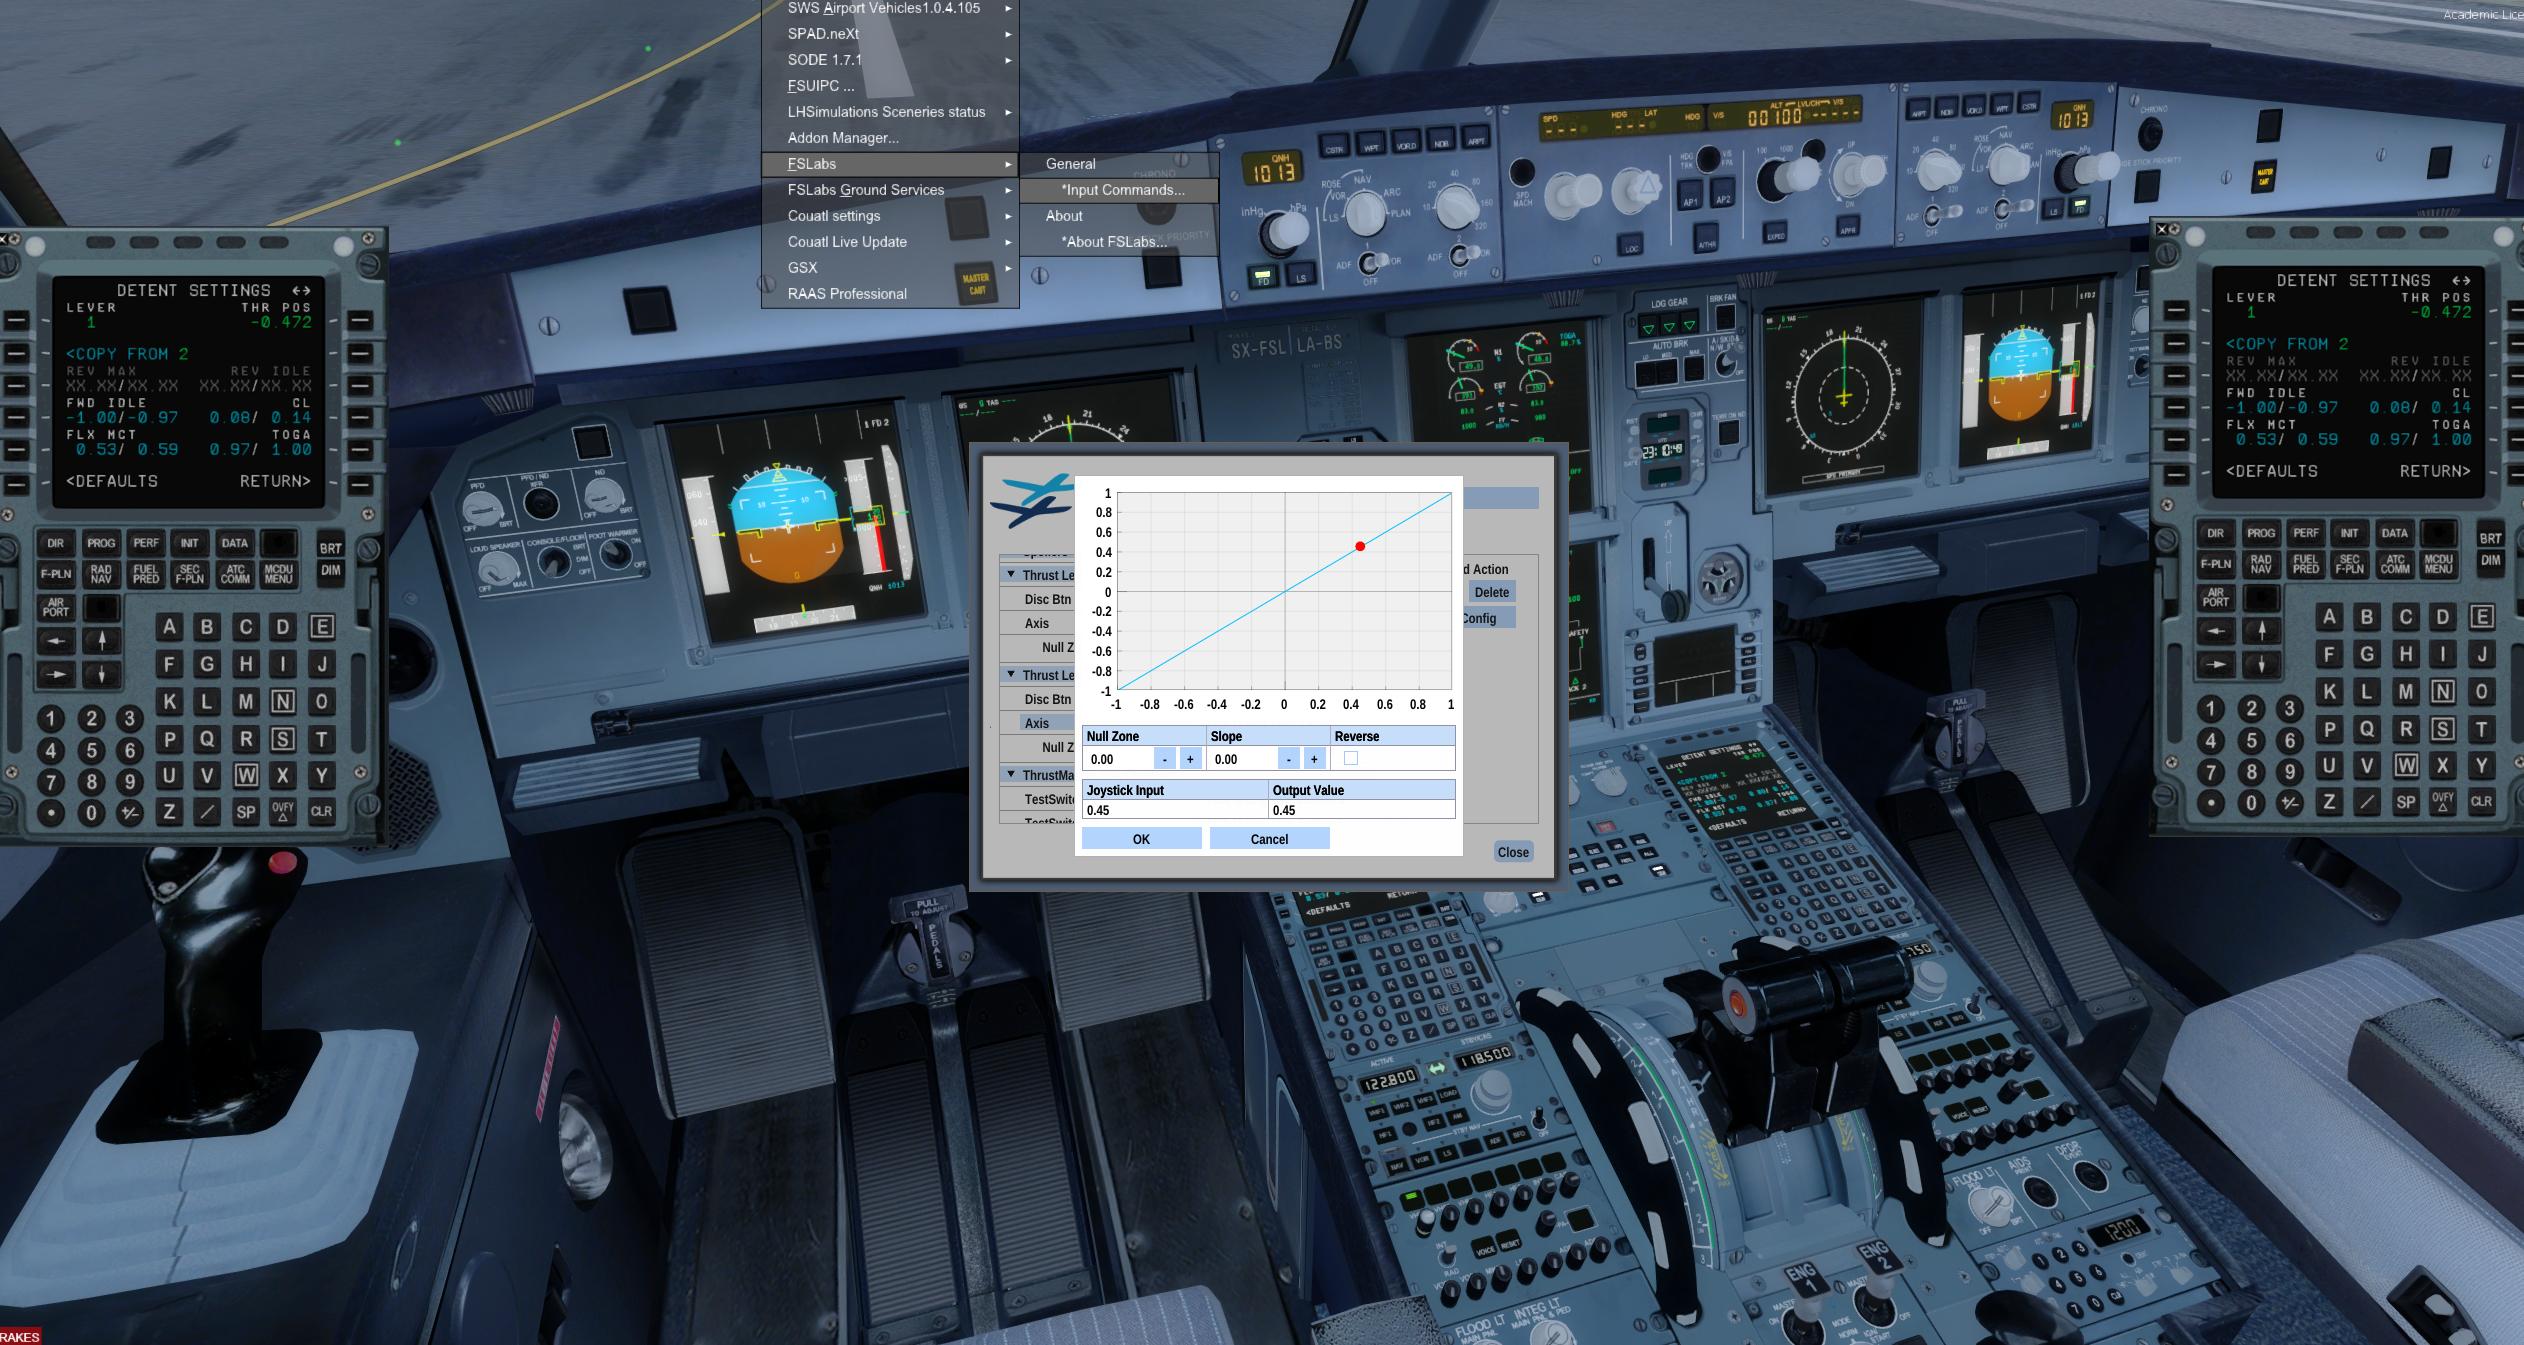 screenshot2021-09-281rljug.png